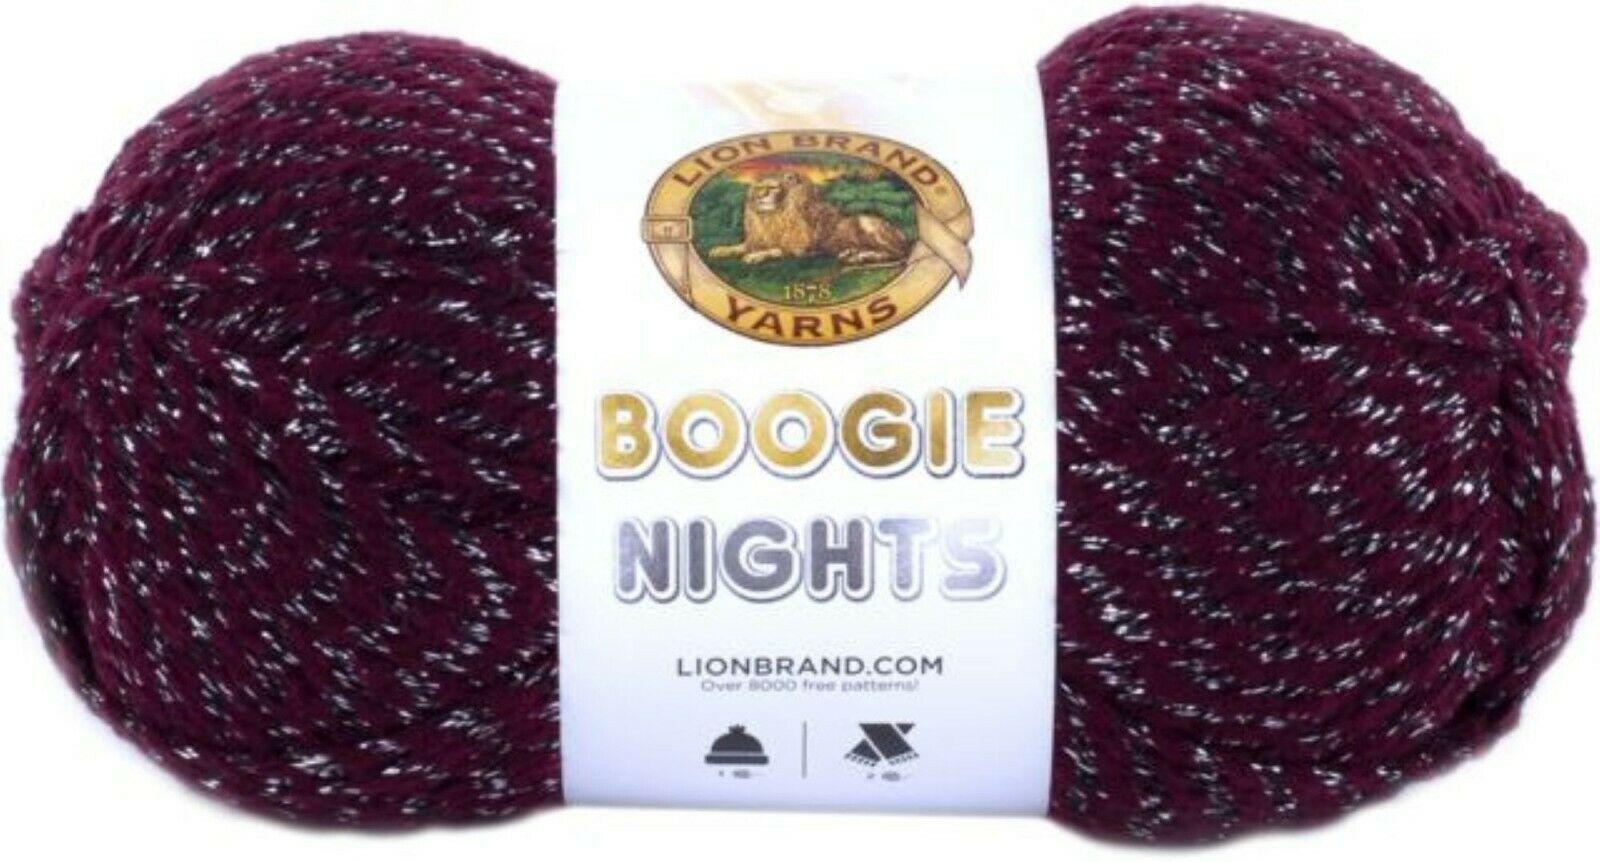 Lion Brand Boogie Nights Yarn in Joker, Bulky 5 Weight